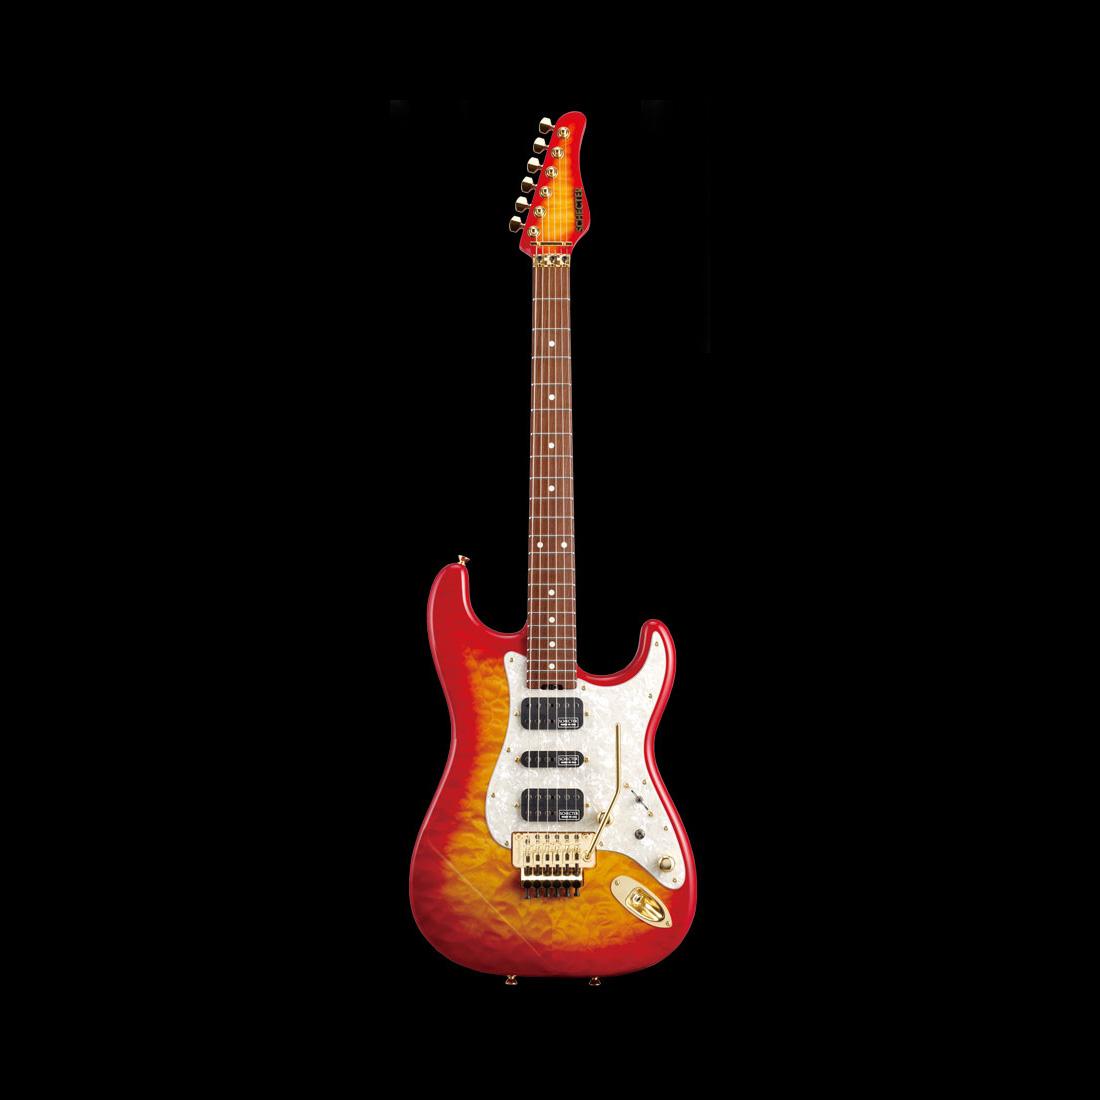 Schecter / ST-V-CTM-FRT 4A R Cherry Sunburst シェクター エレキギター 《受注生産:予約受付中》